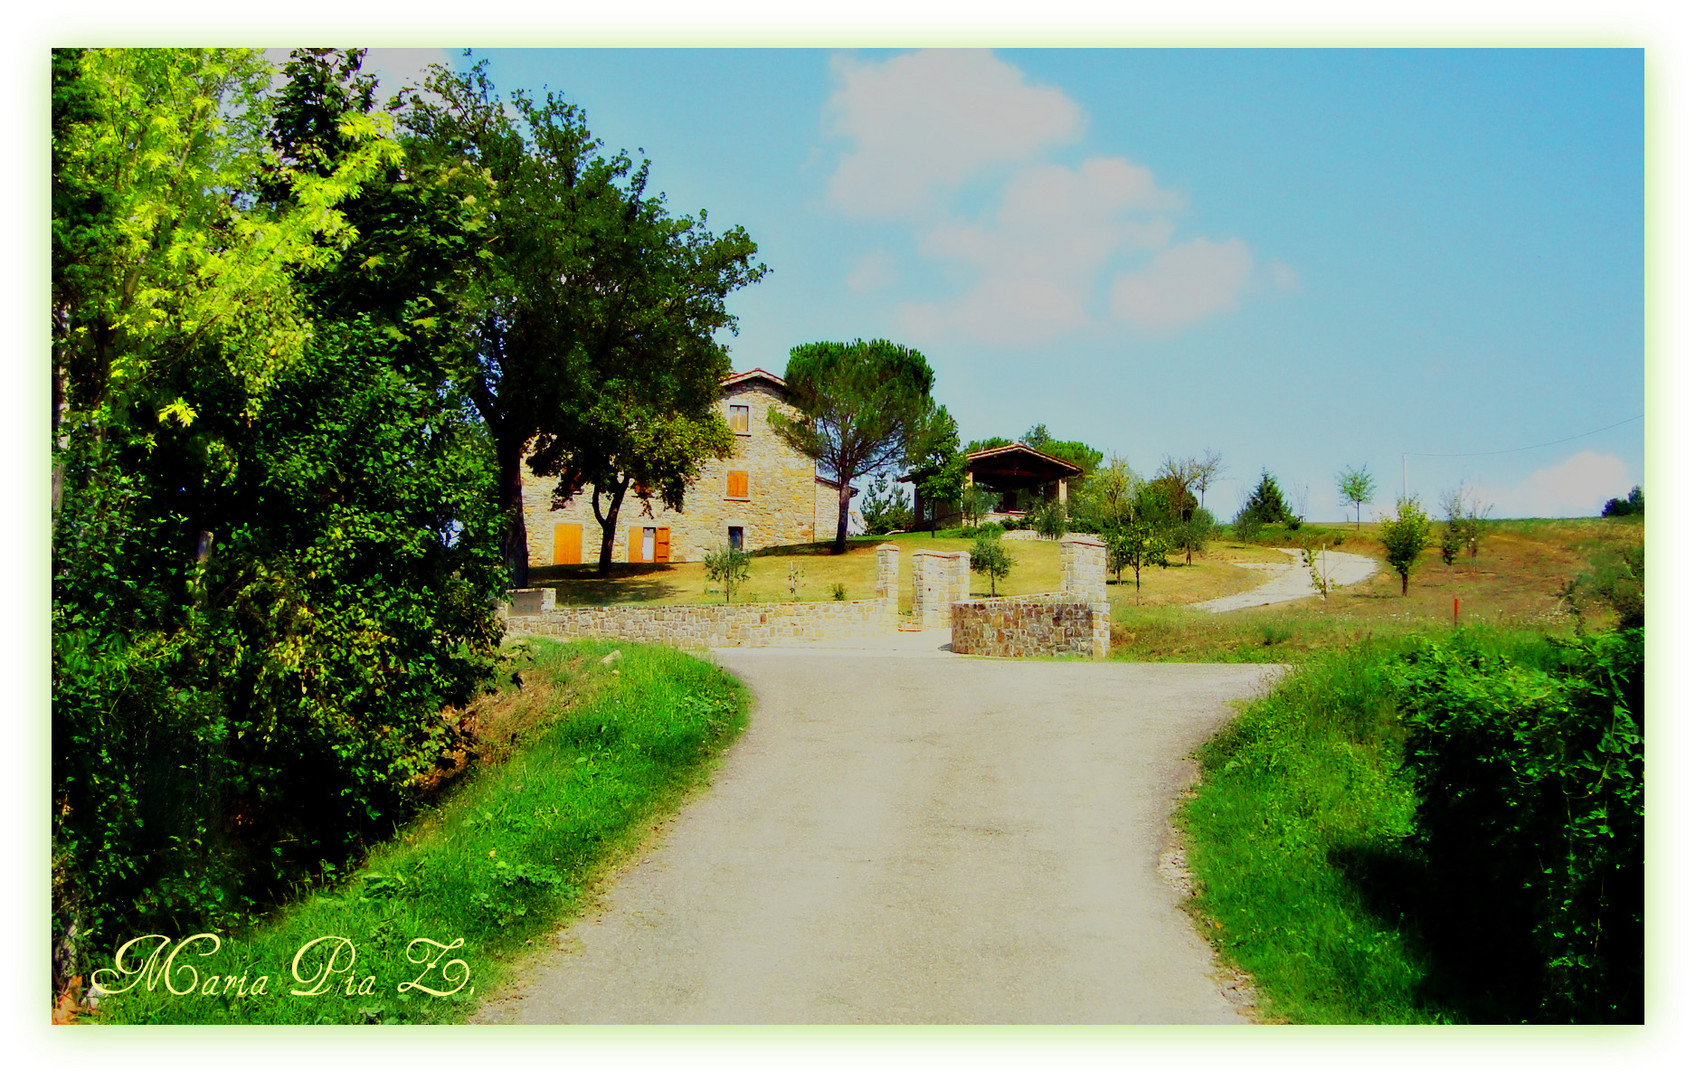 Incantevole Toscana